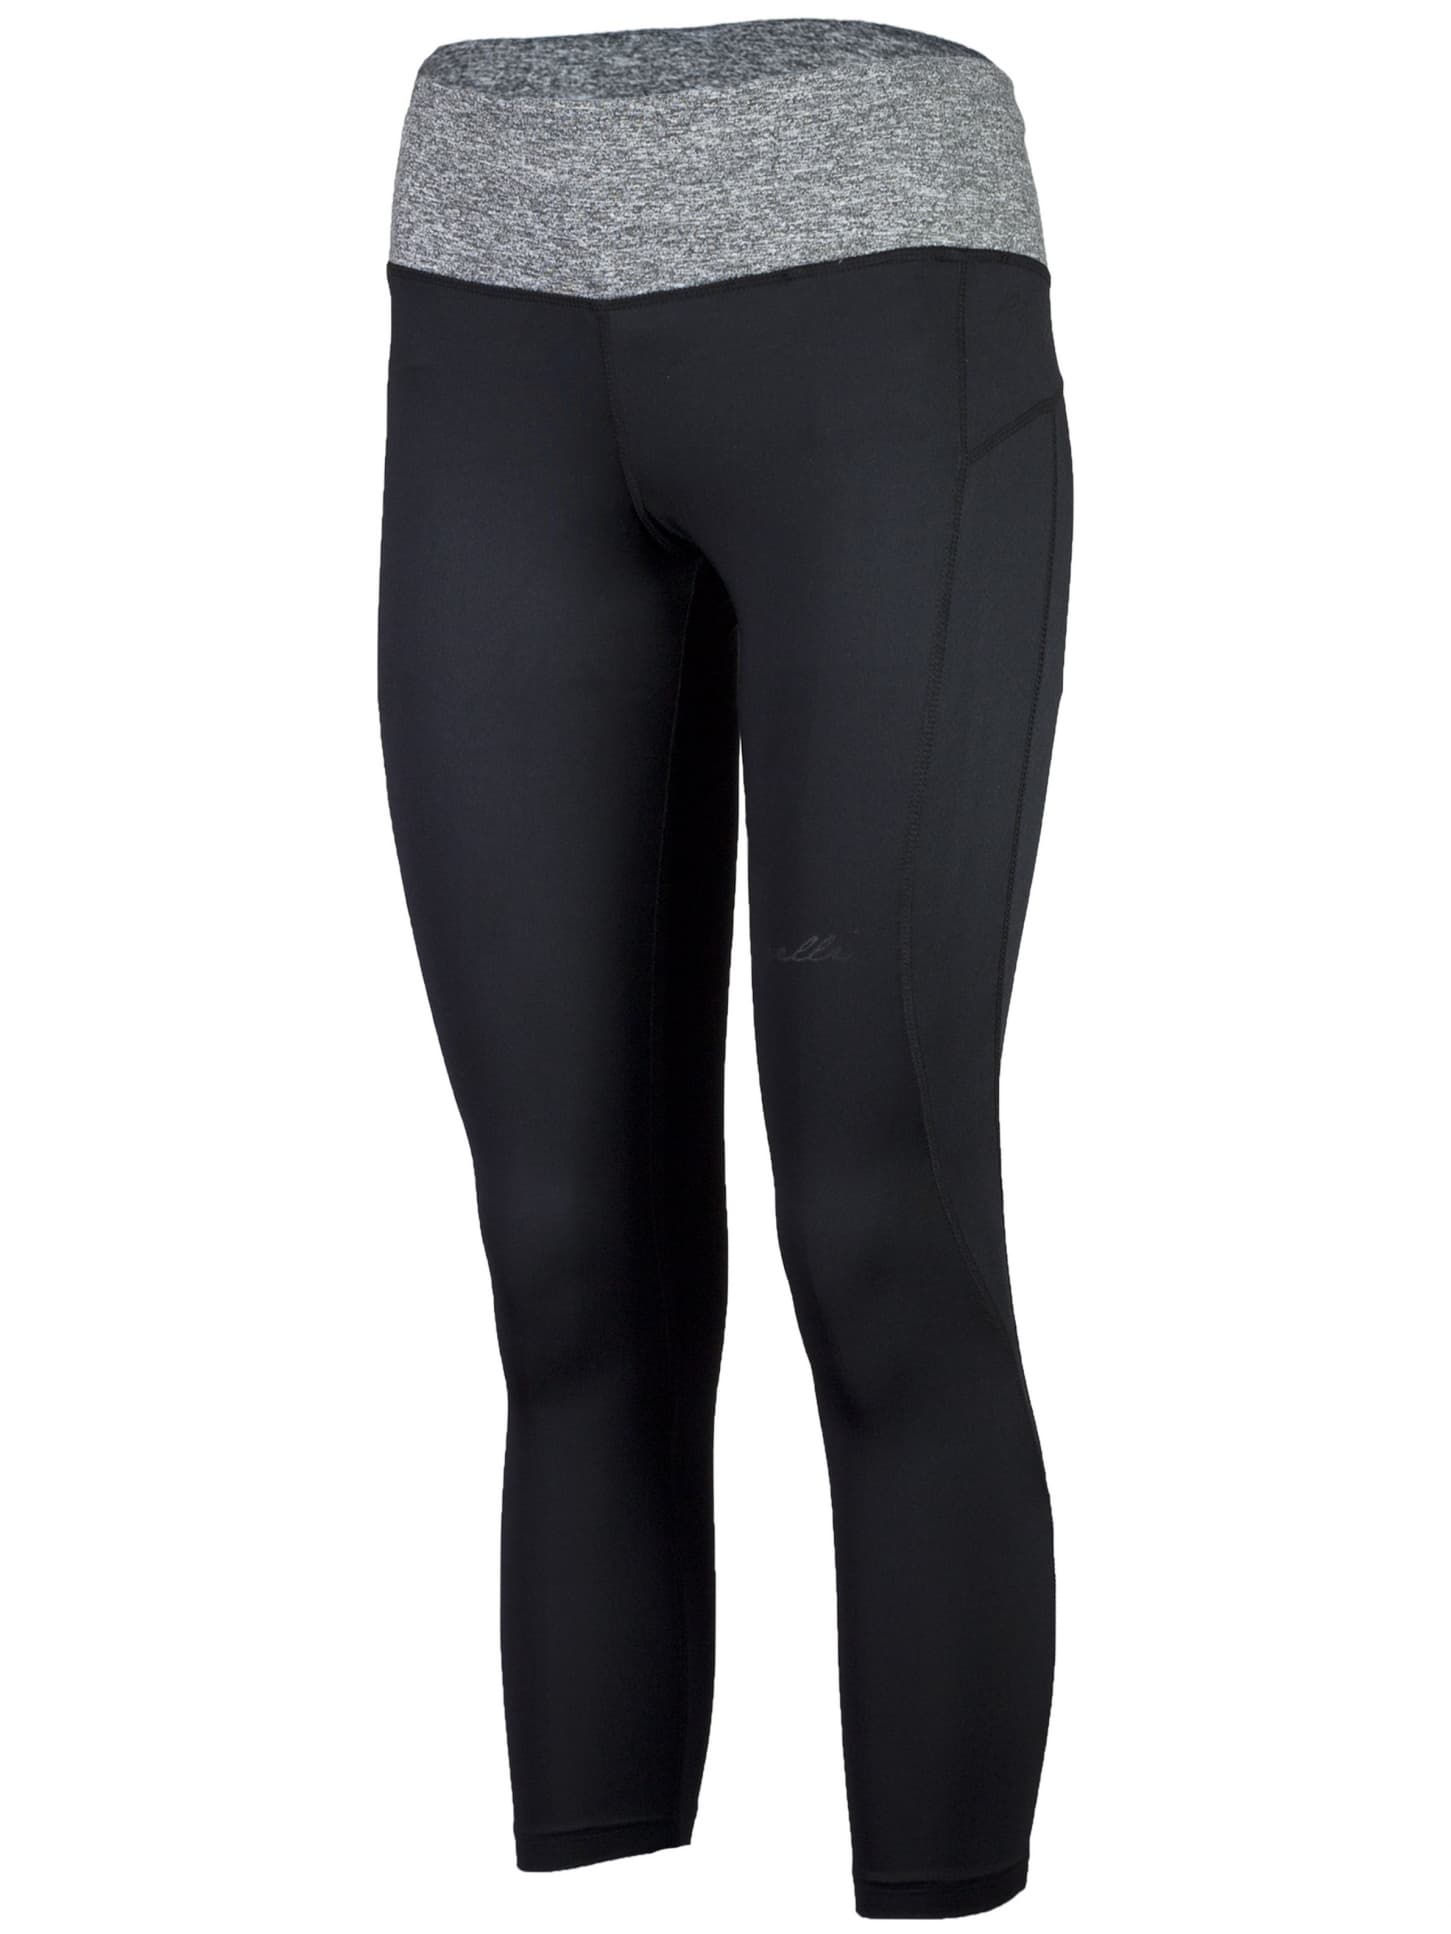 e9bee05e07a5 Dámske fitness nohavice 7 8 dĺžky Rogelli ROSIA